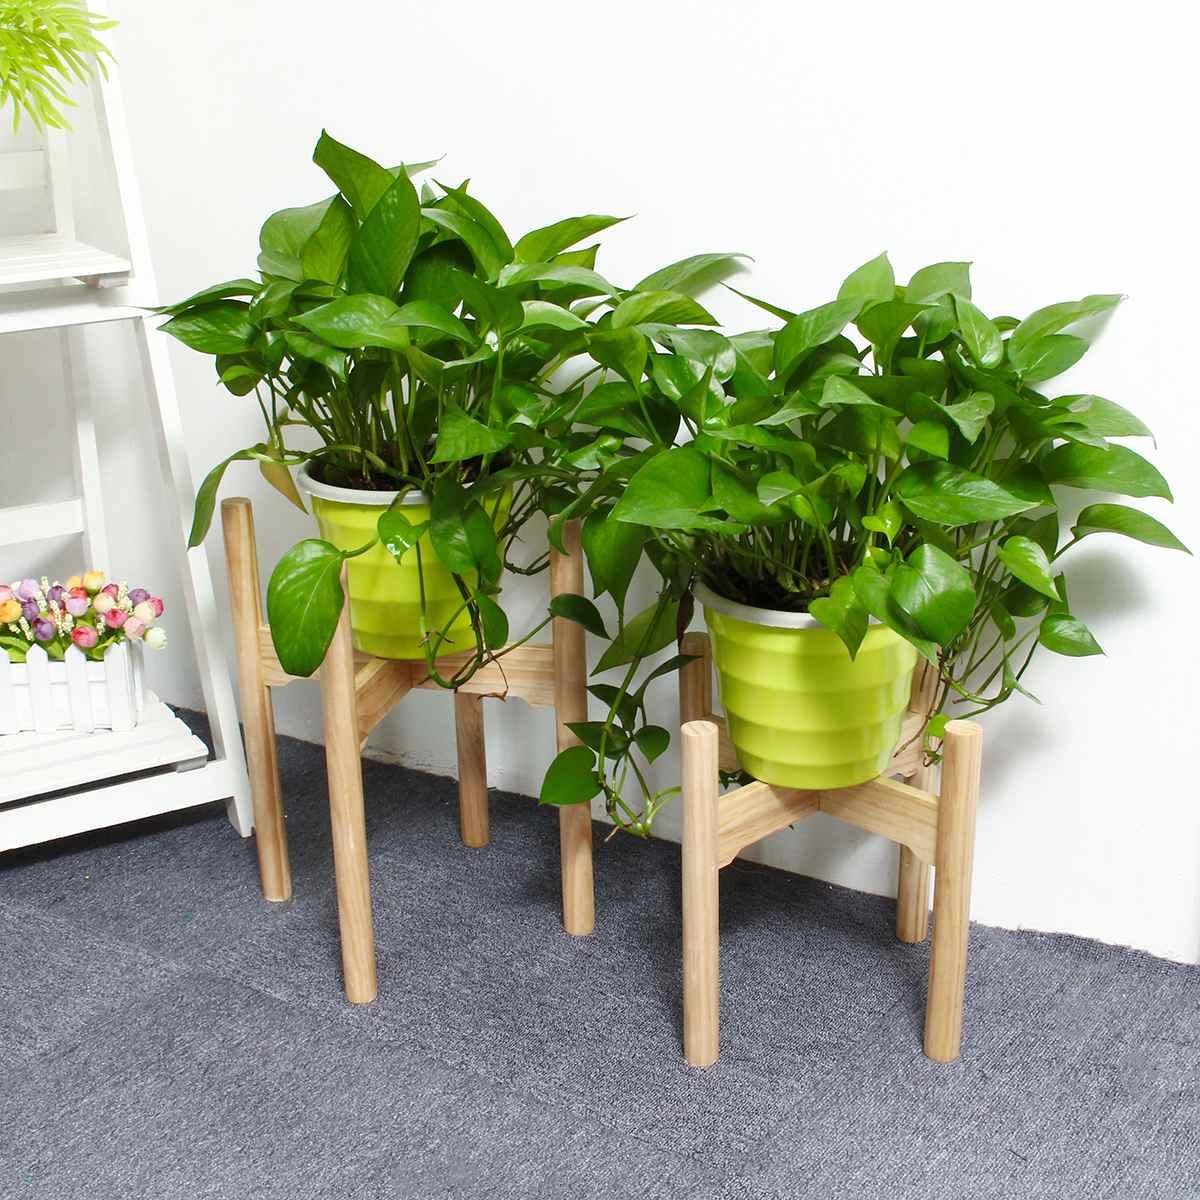 Furniture New Plant Shelves Flower Garden Wooden Plant Stand Flower Pot Garden Rack Stand Flower Display Wood Shelf Storage Rack